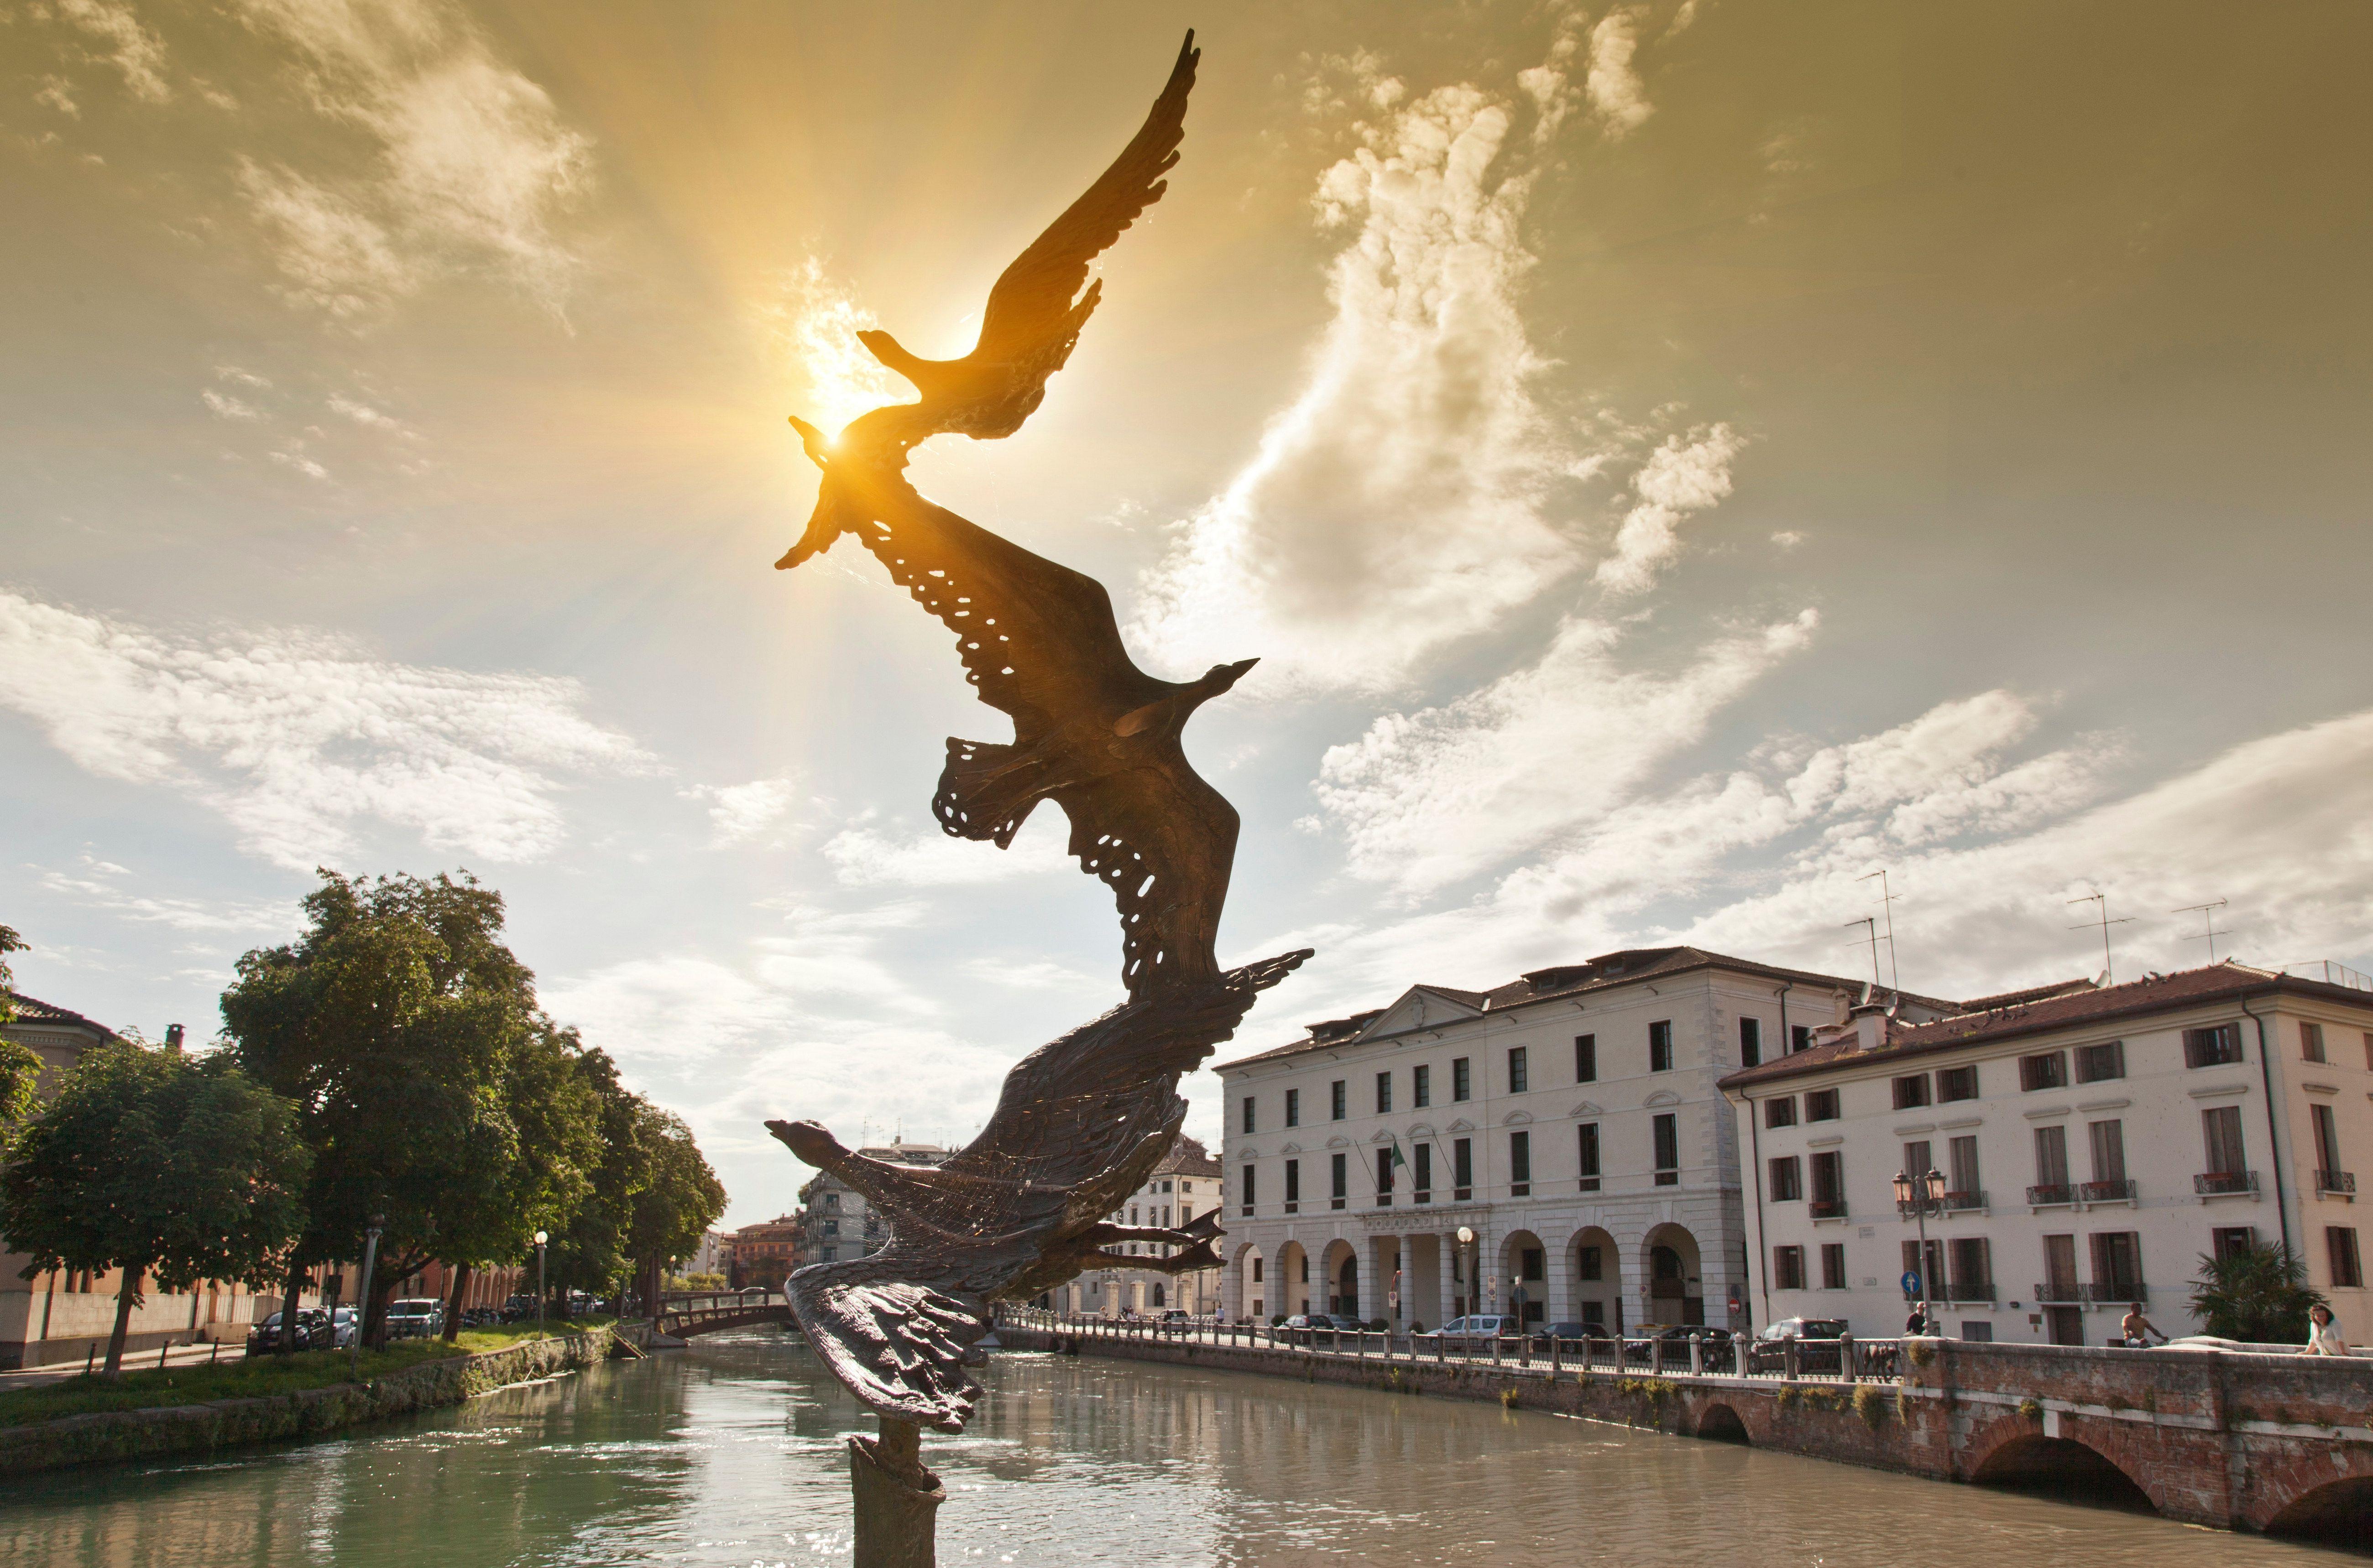 Bird sculpture on river, Treviso, Italy